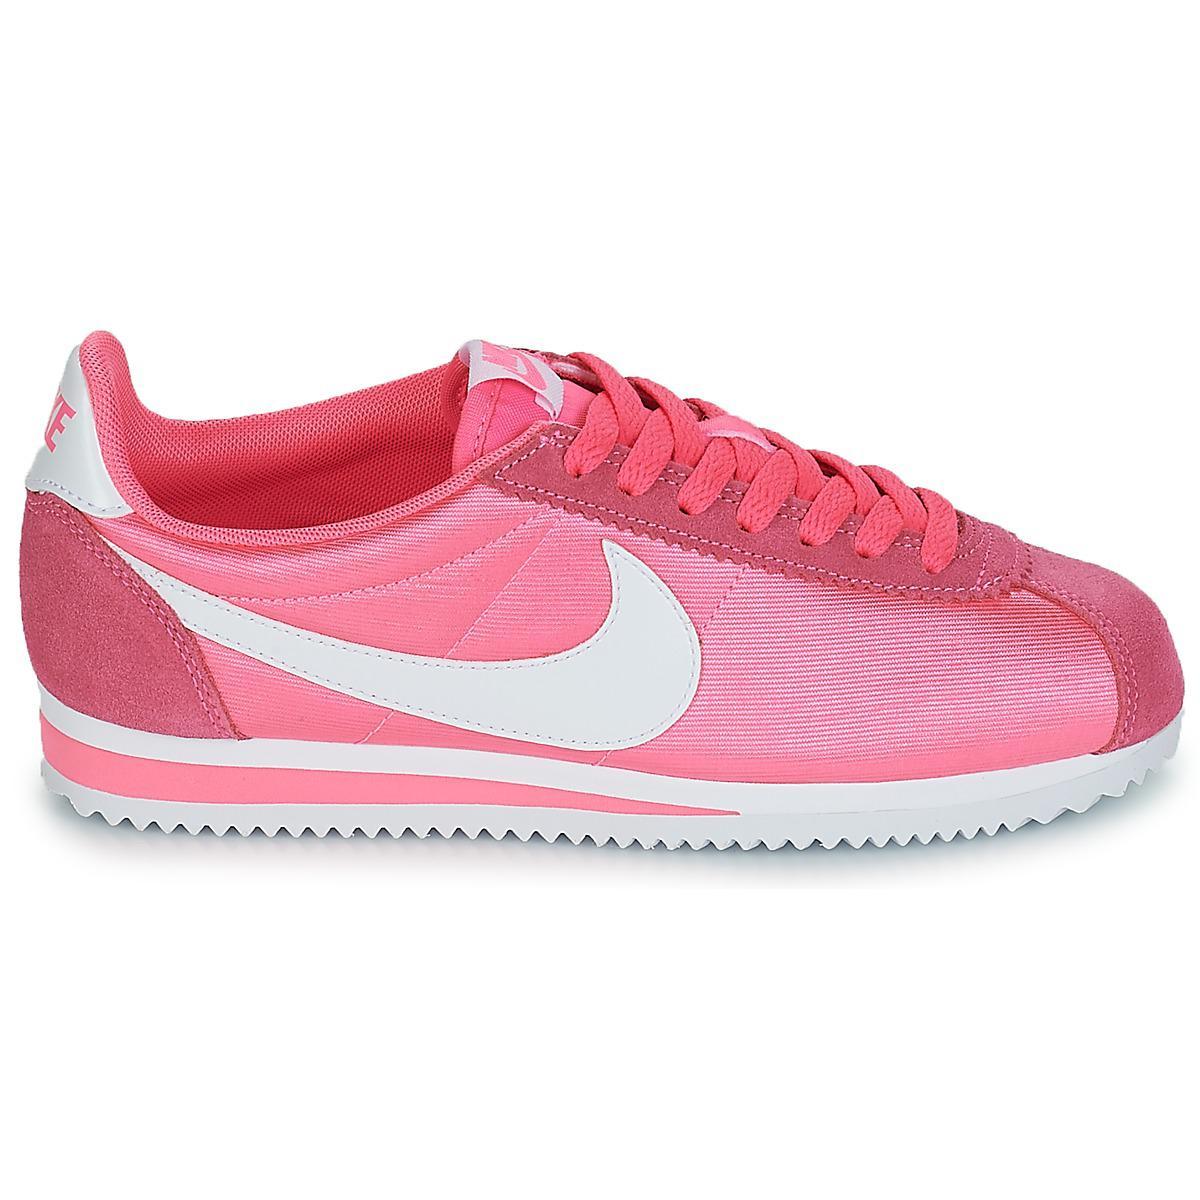 c723f07c2ec2f7 Nike - Classic Cortez Nylon W Women s Shoes (trainers) In Pink - Lyst. View  fullscreen